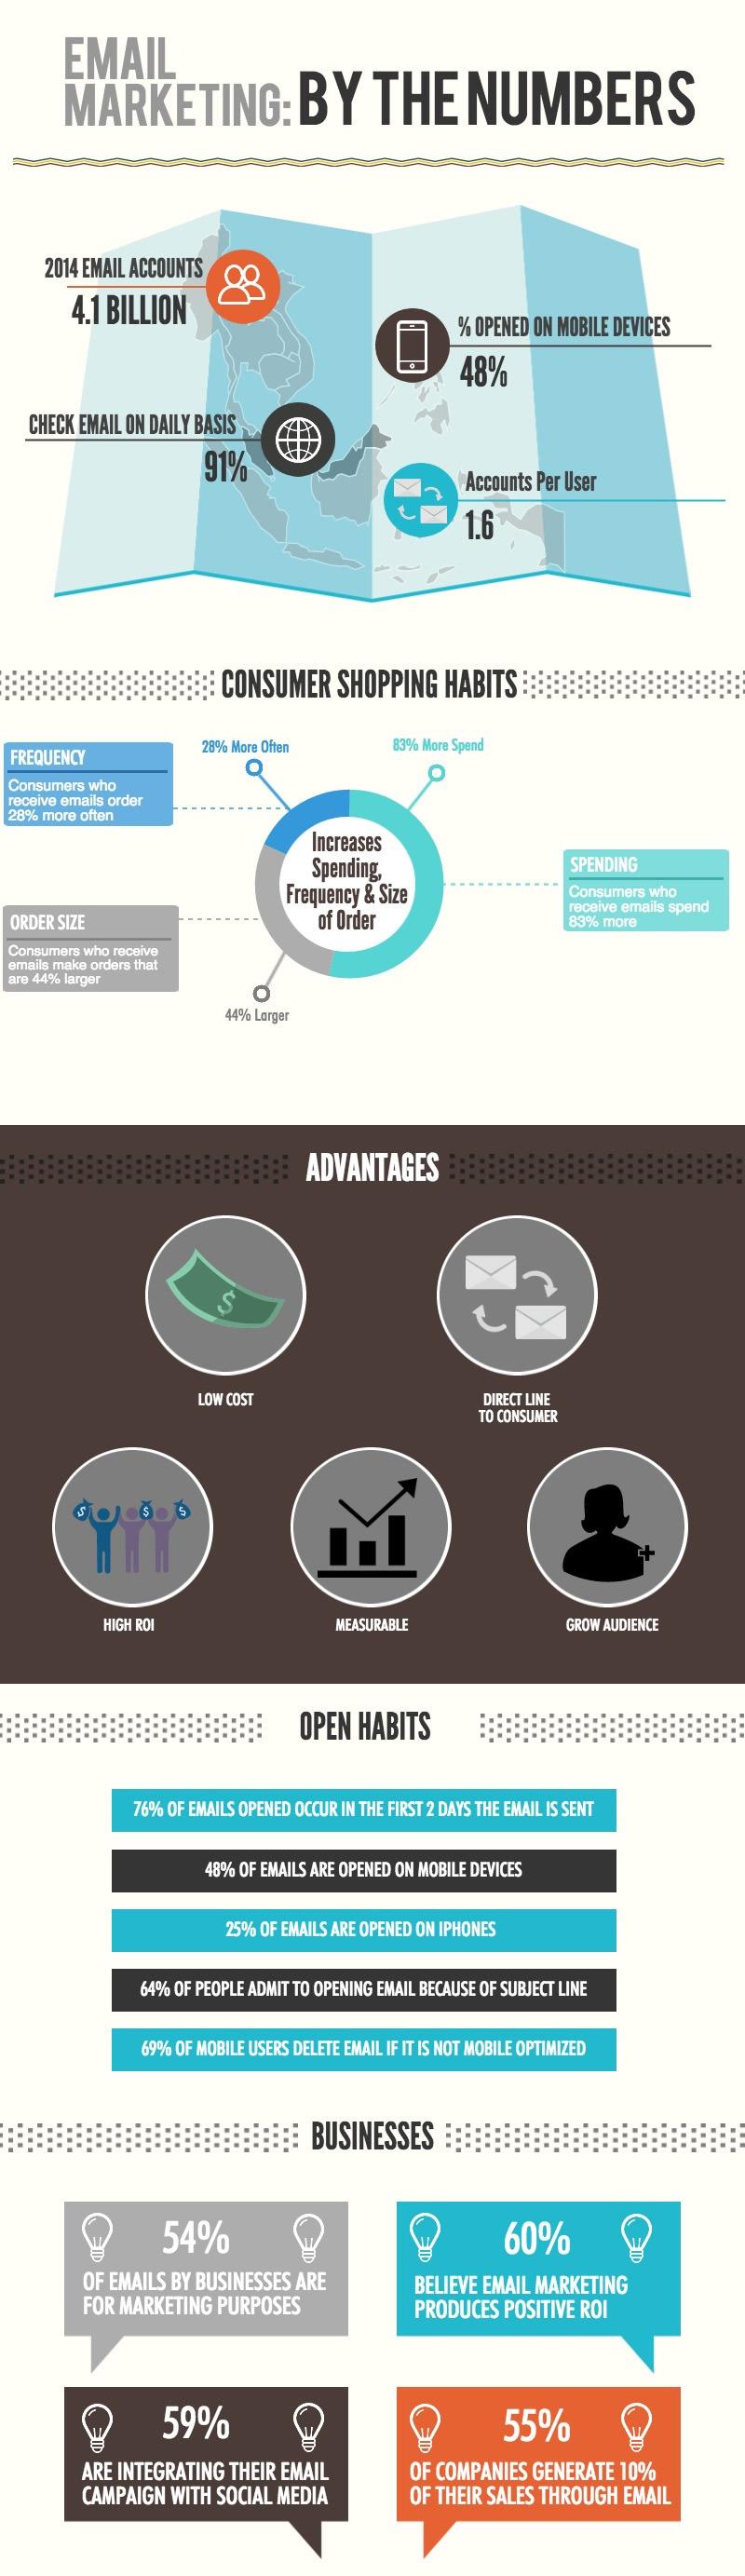 Untitled-Infographic-13_jpg